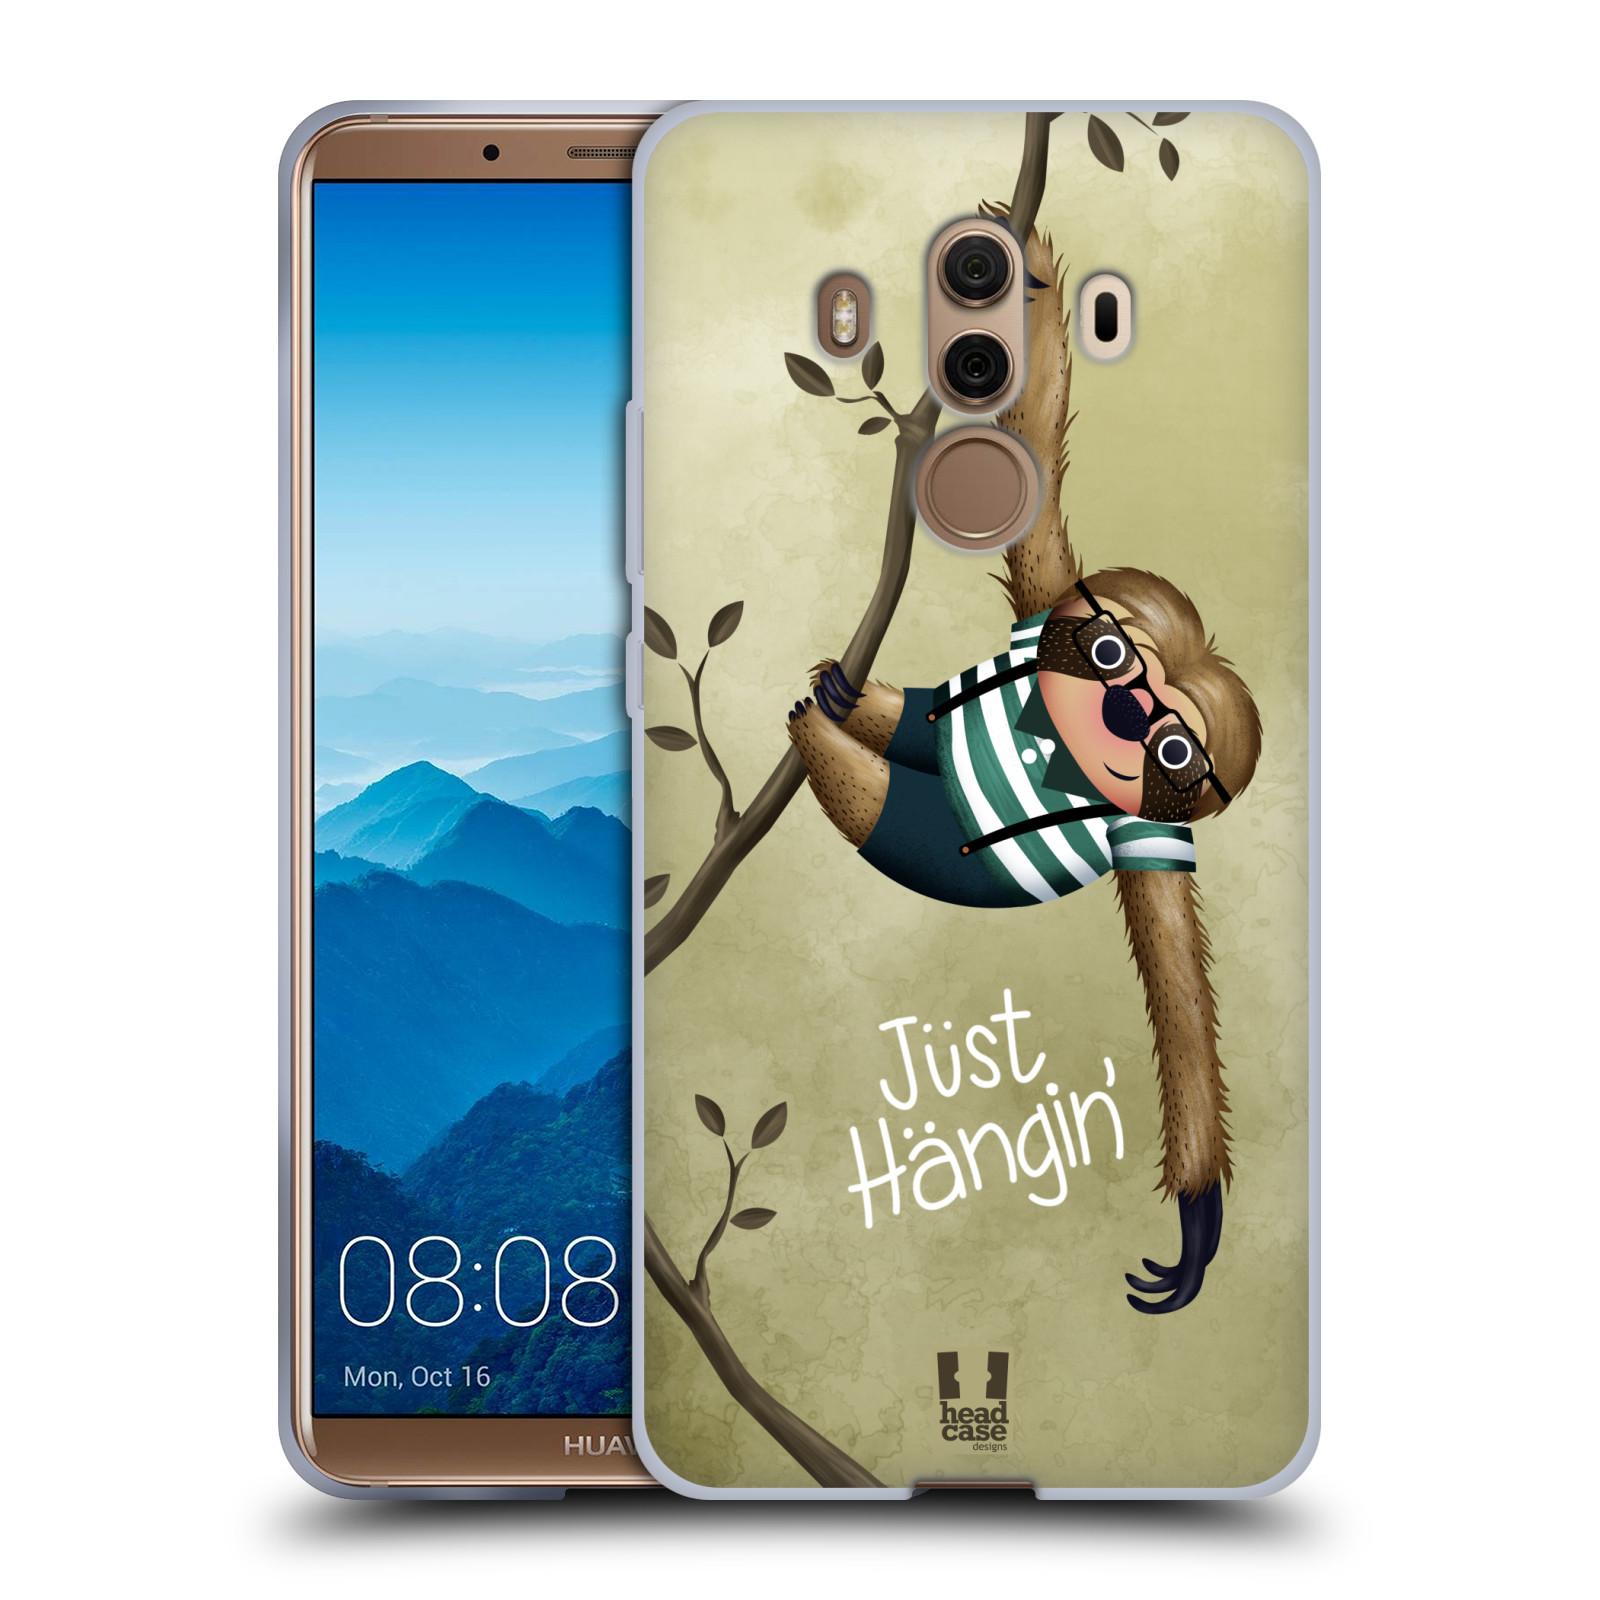 Silikonové pouzdro na mobil Huawei Mate 10 Pro - Head Case - Lenochod Just Hangin